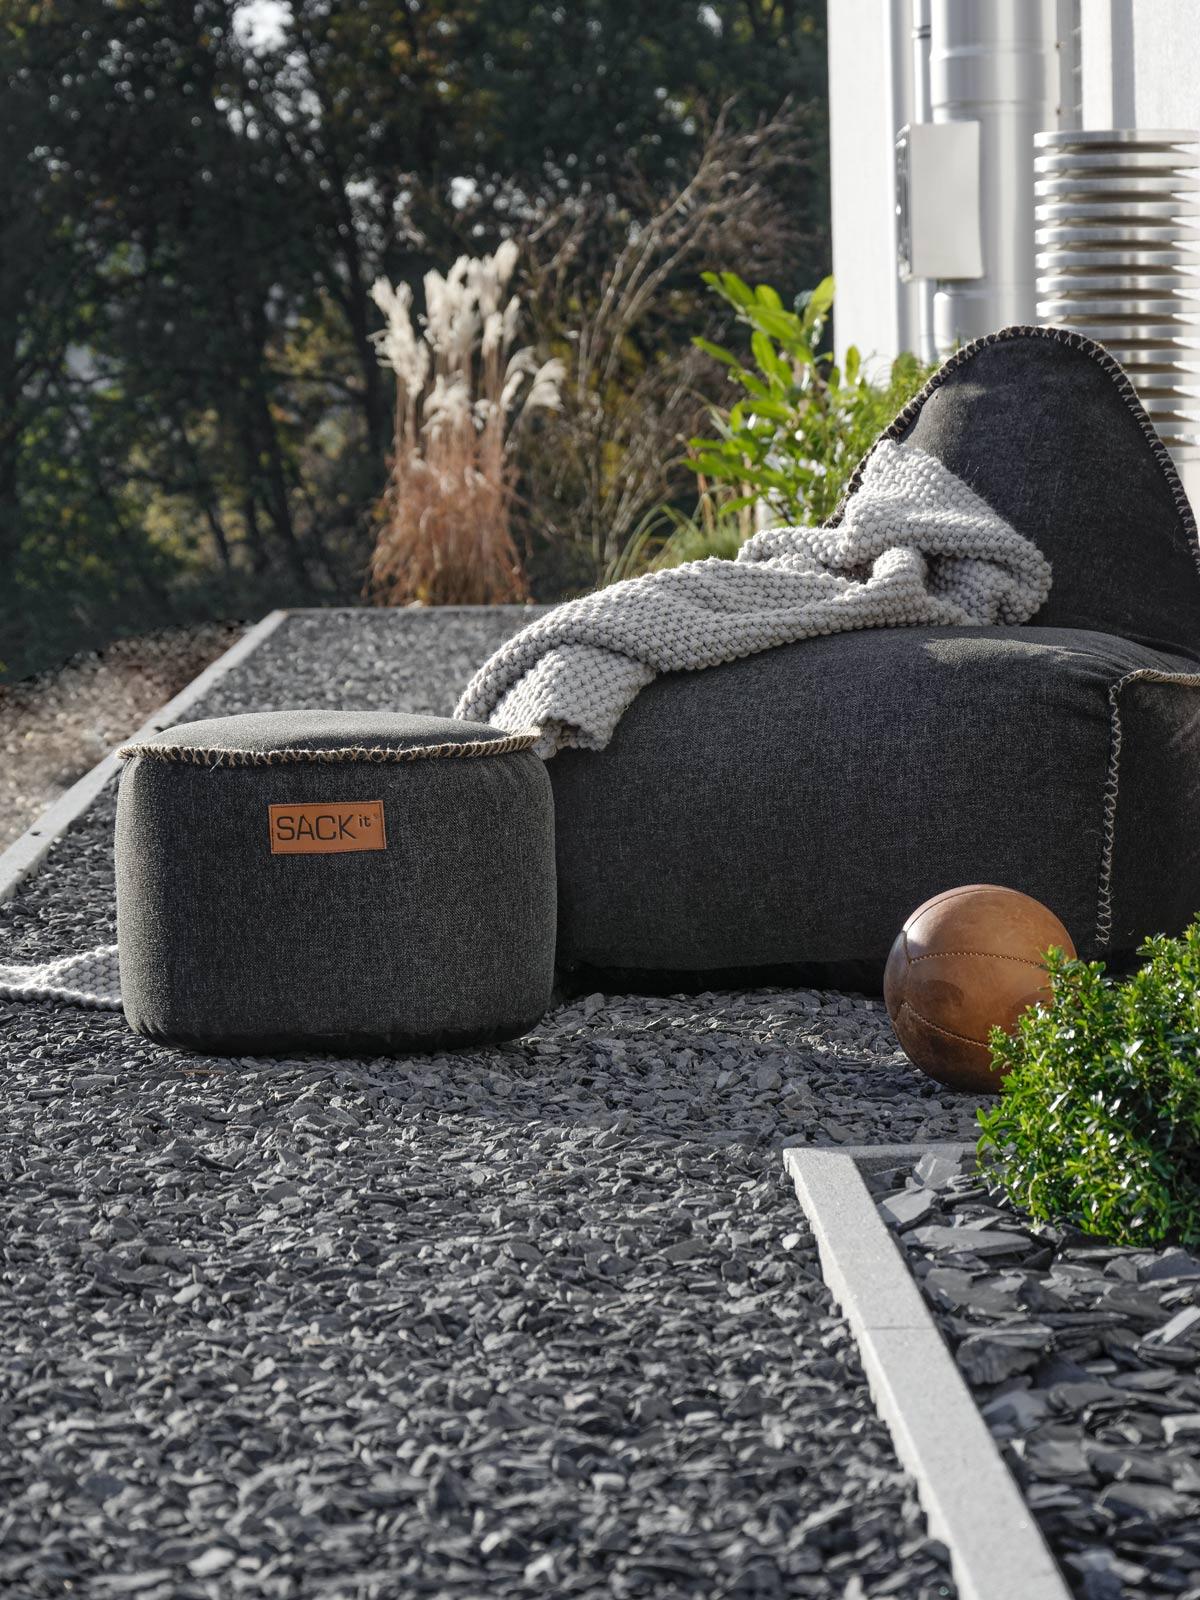 sack-it-sitzsack-im-herbstgarten